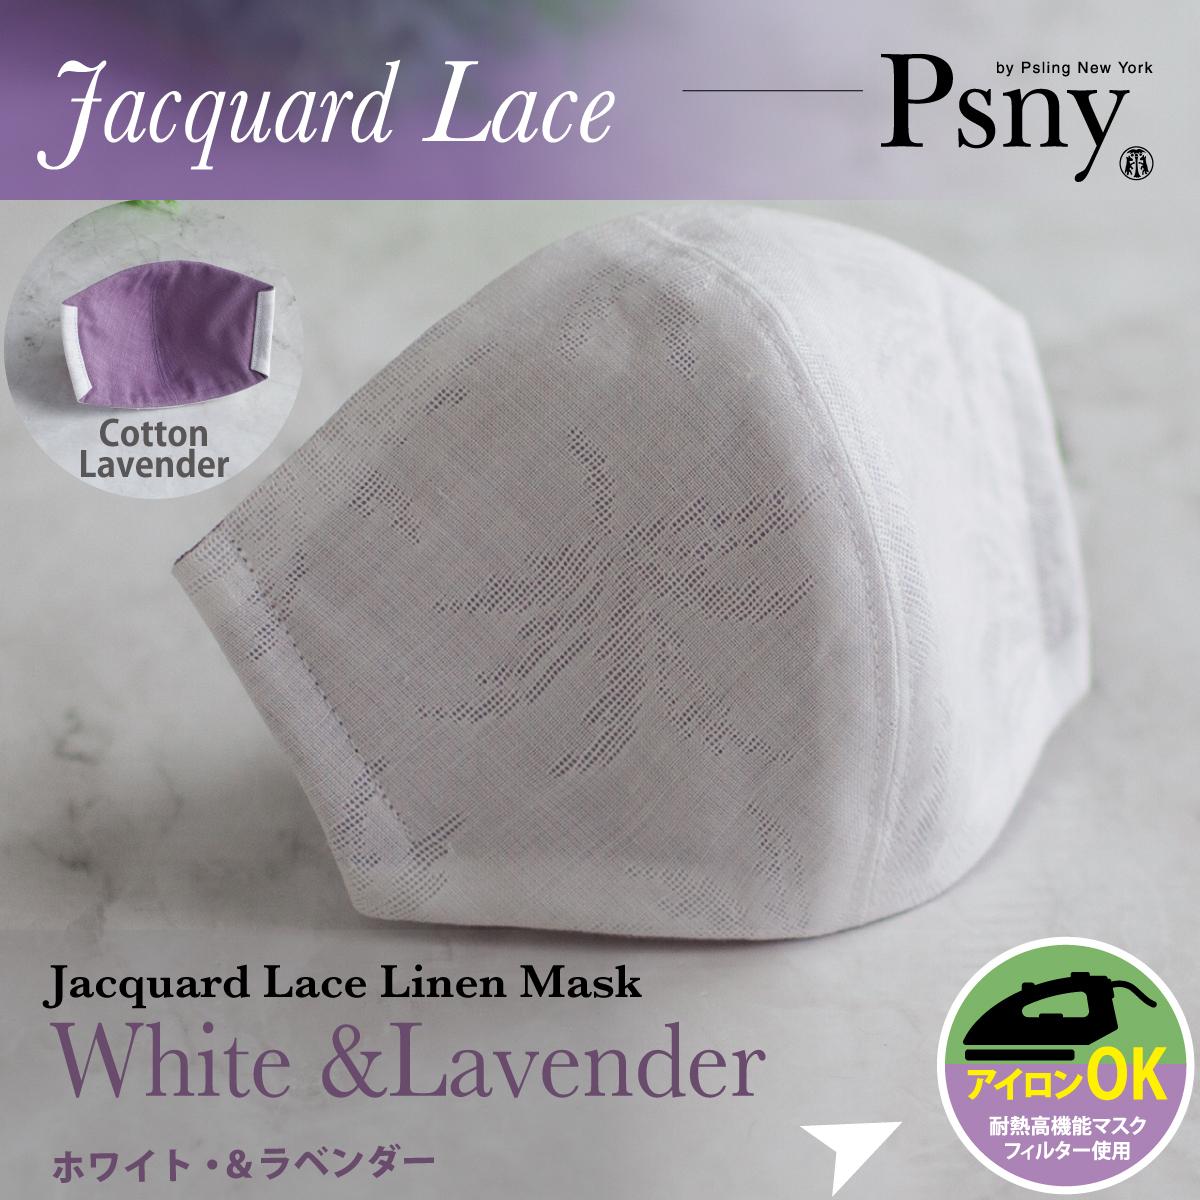 PSNY ジャガード リネン&ラベンダー 花粉 黄砂 洗える不織布フィルター入り 立体 大人用 マスク 送料無料 P21